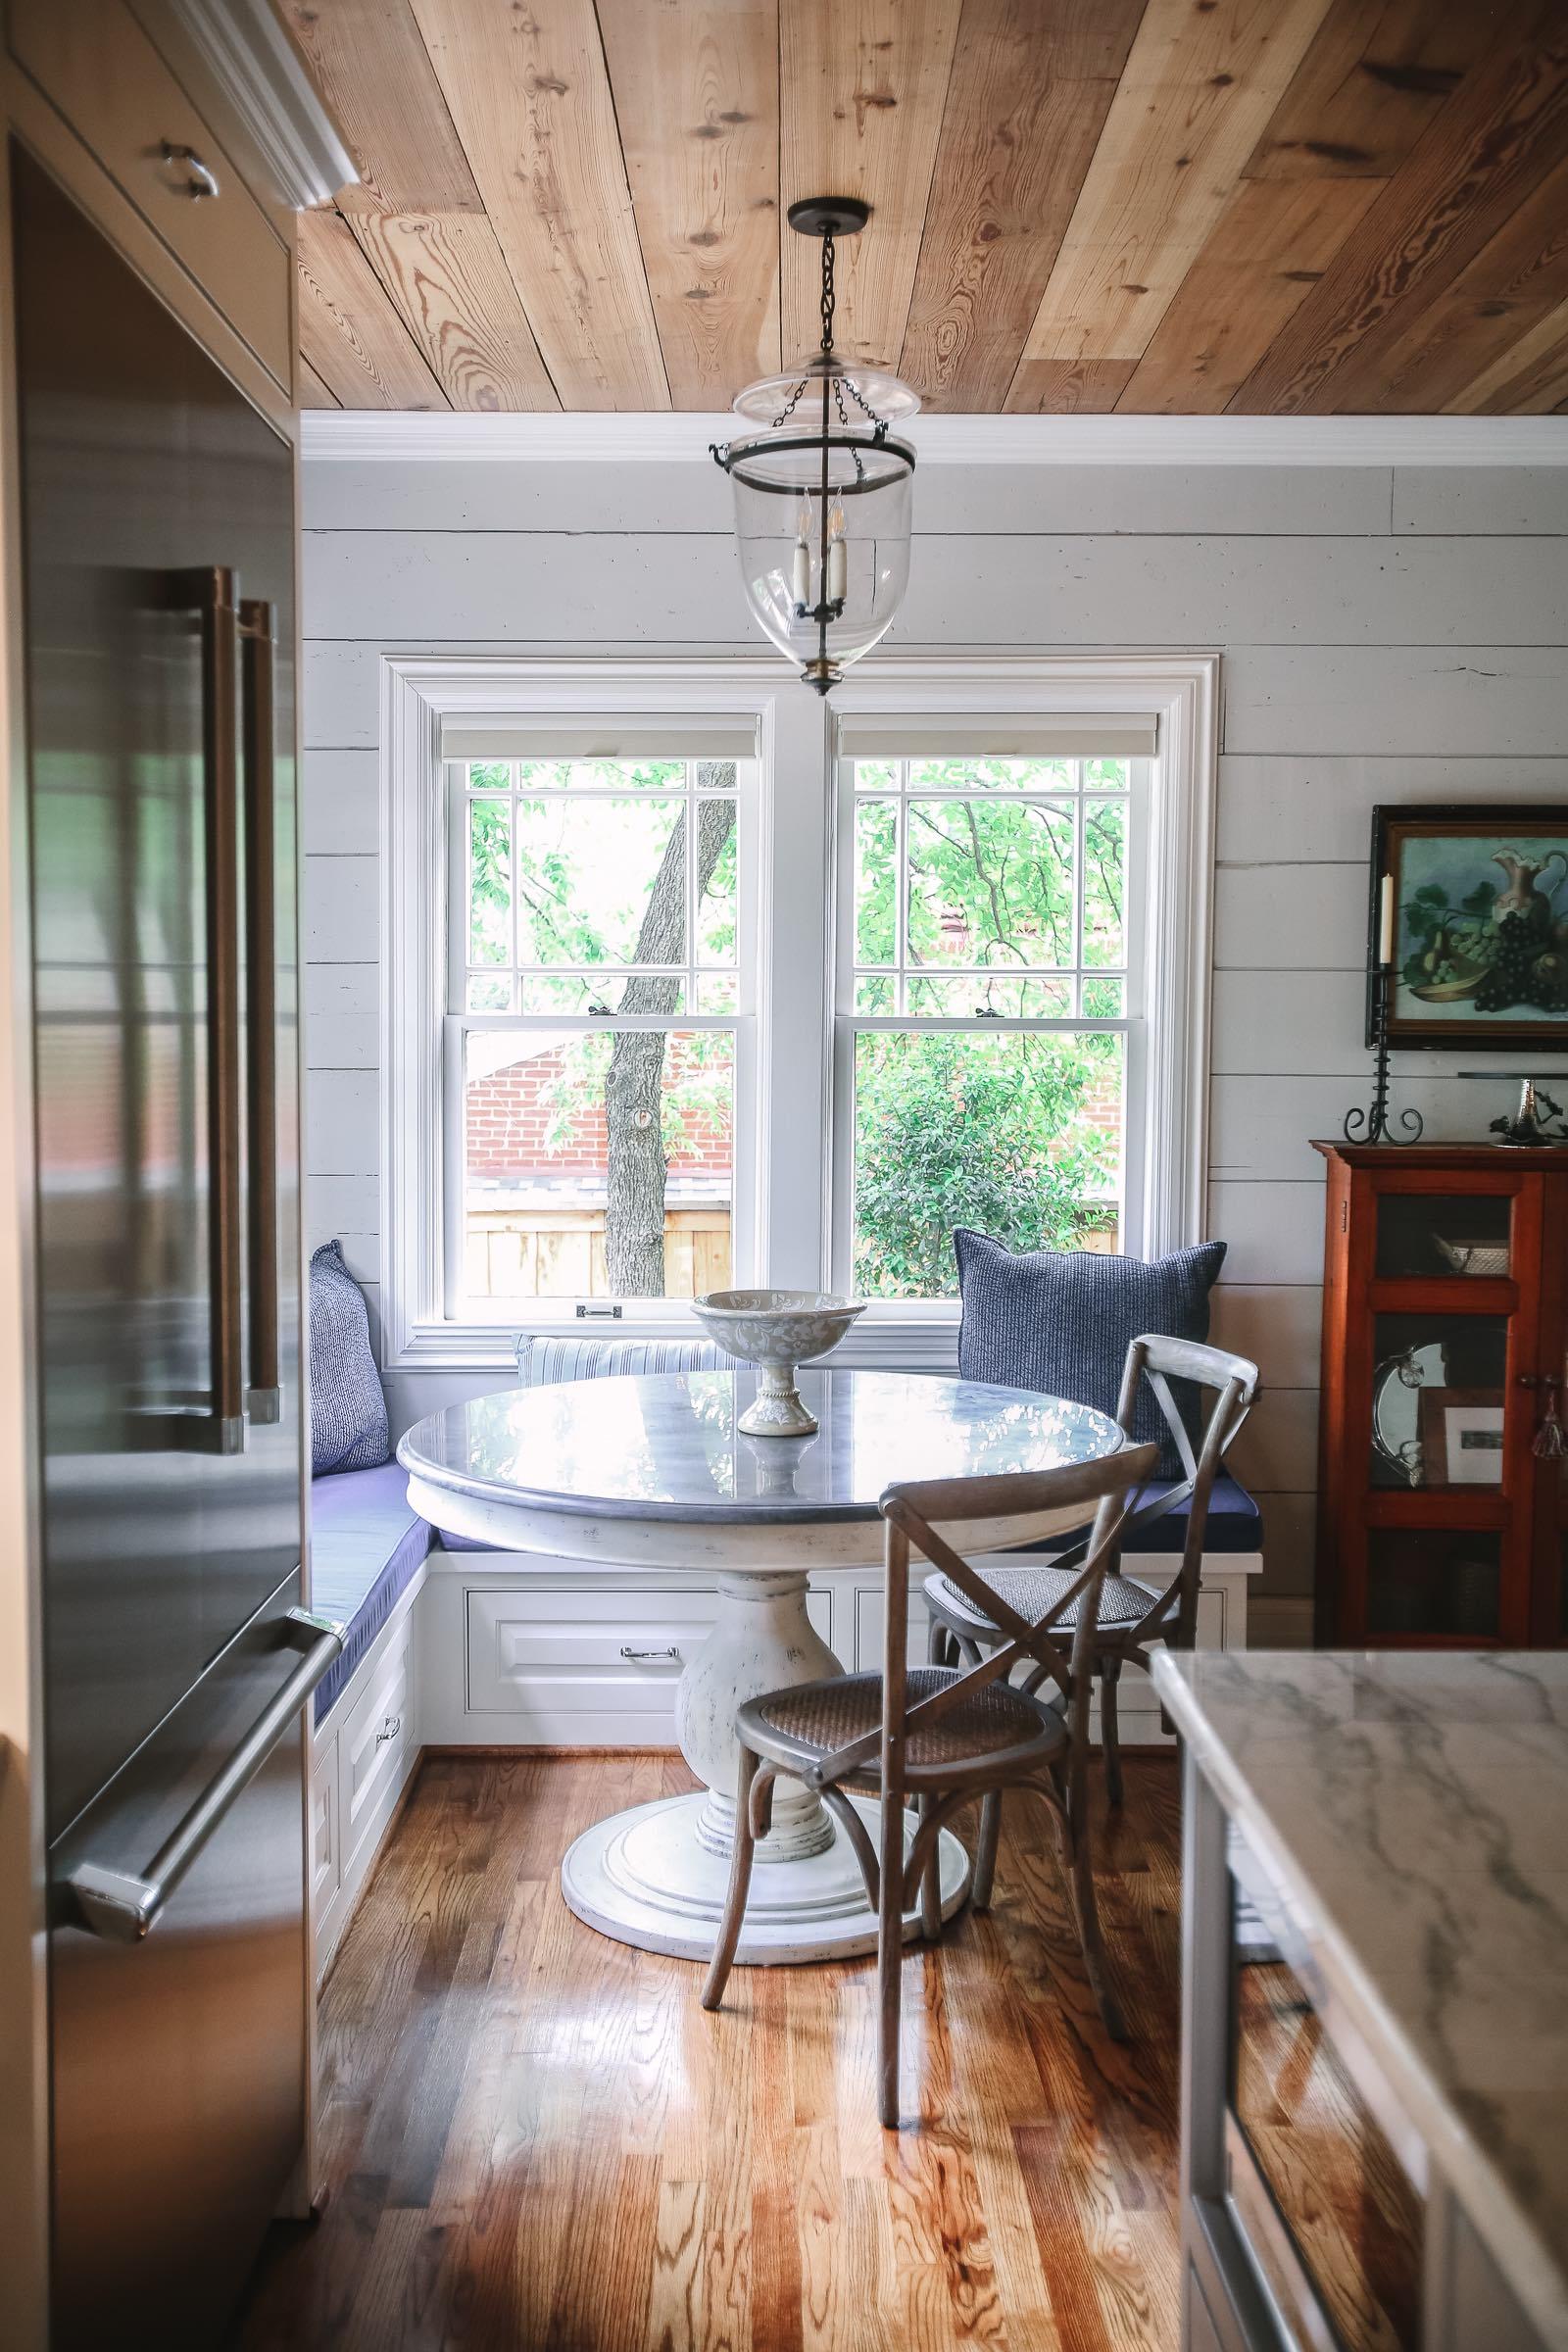 historic home breakfast nook remodel.jpg